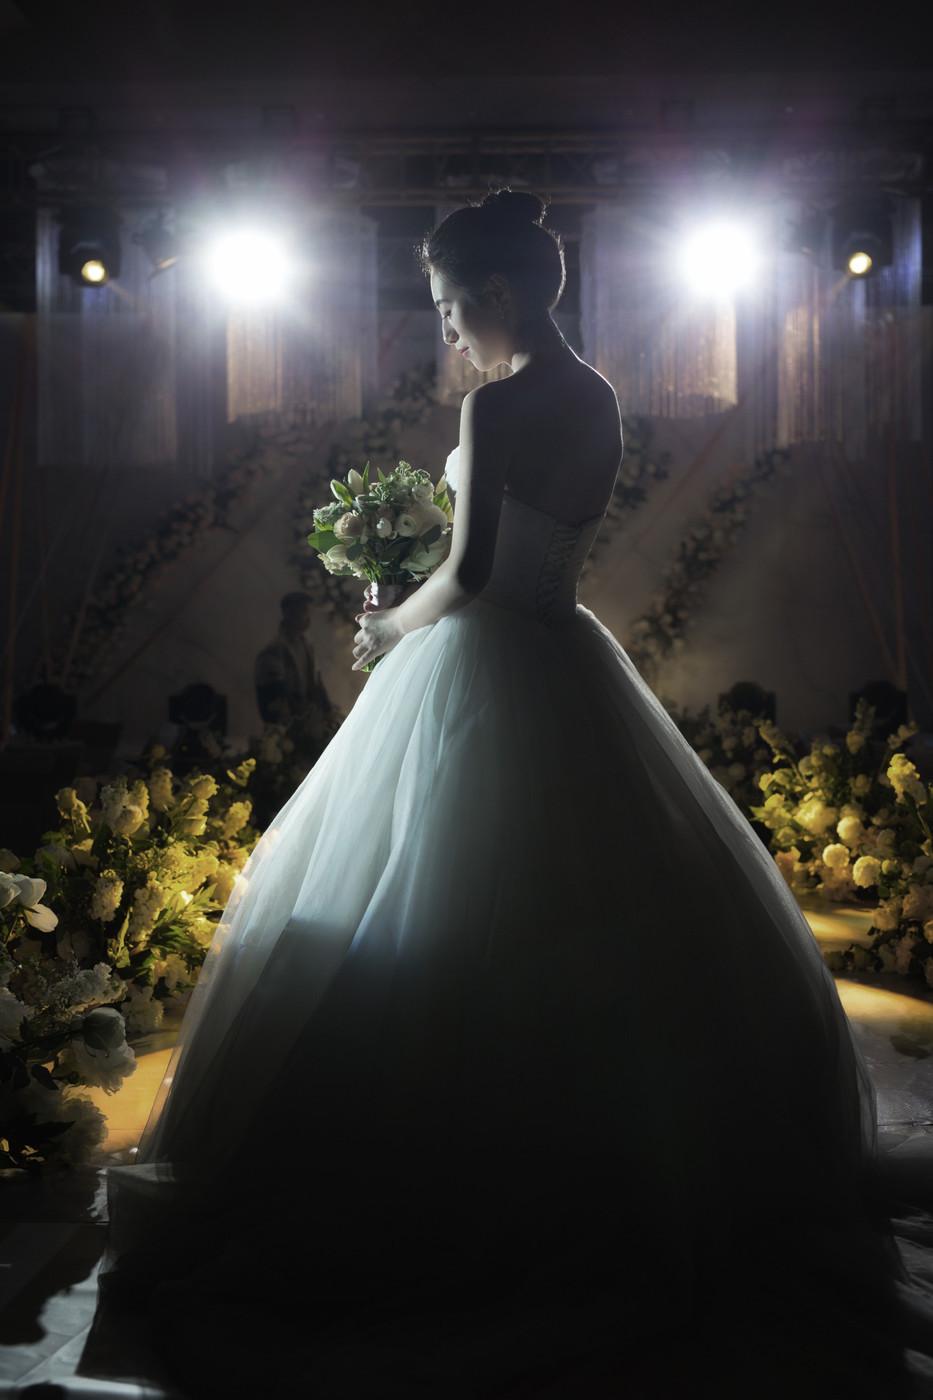 【KAI 婚礼纪实】Z&Y 常州婚礼23